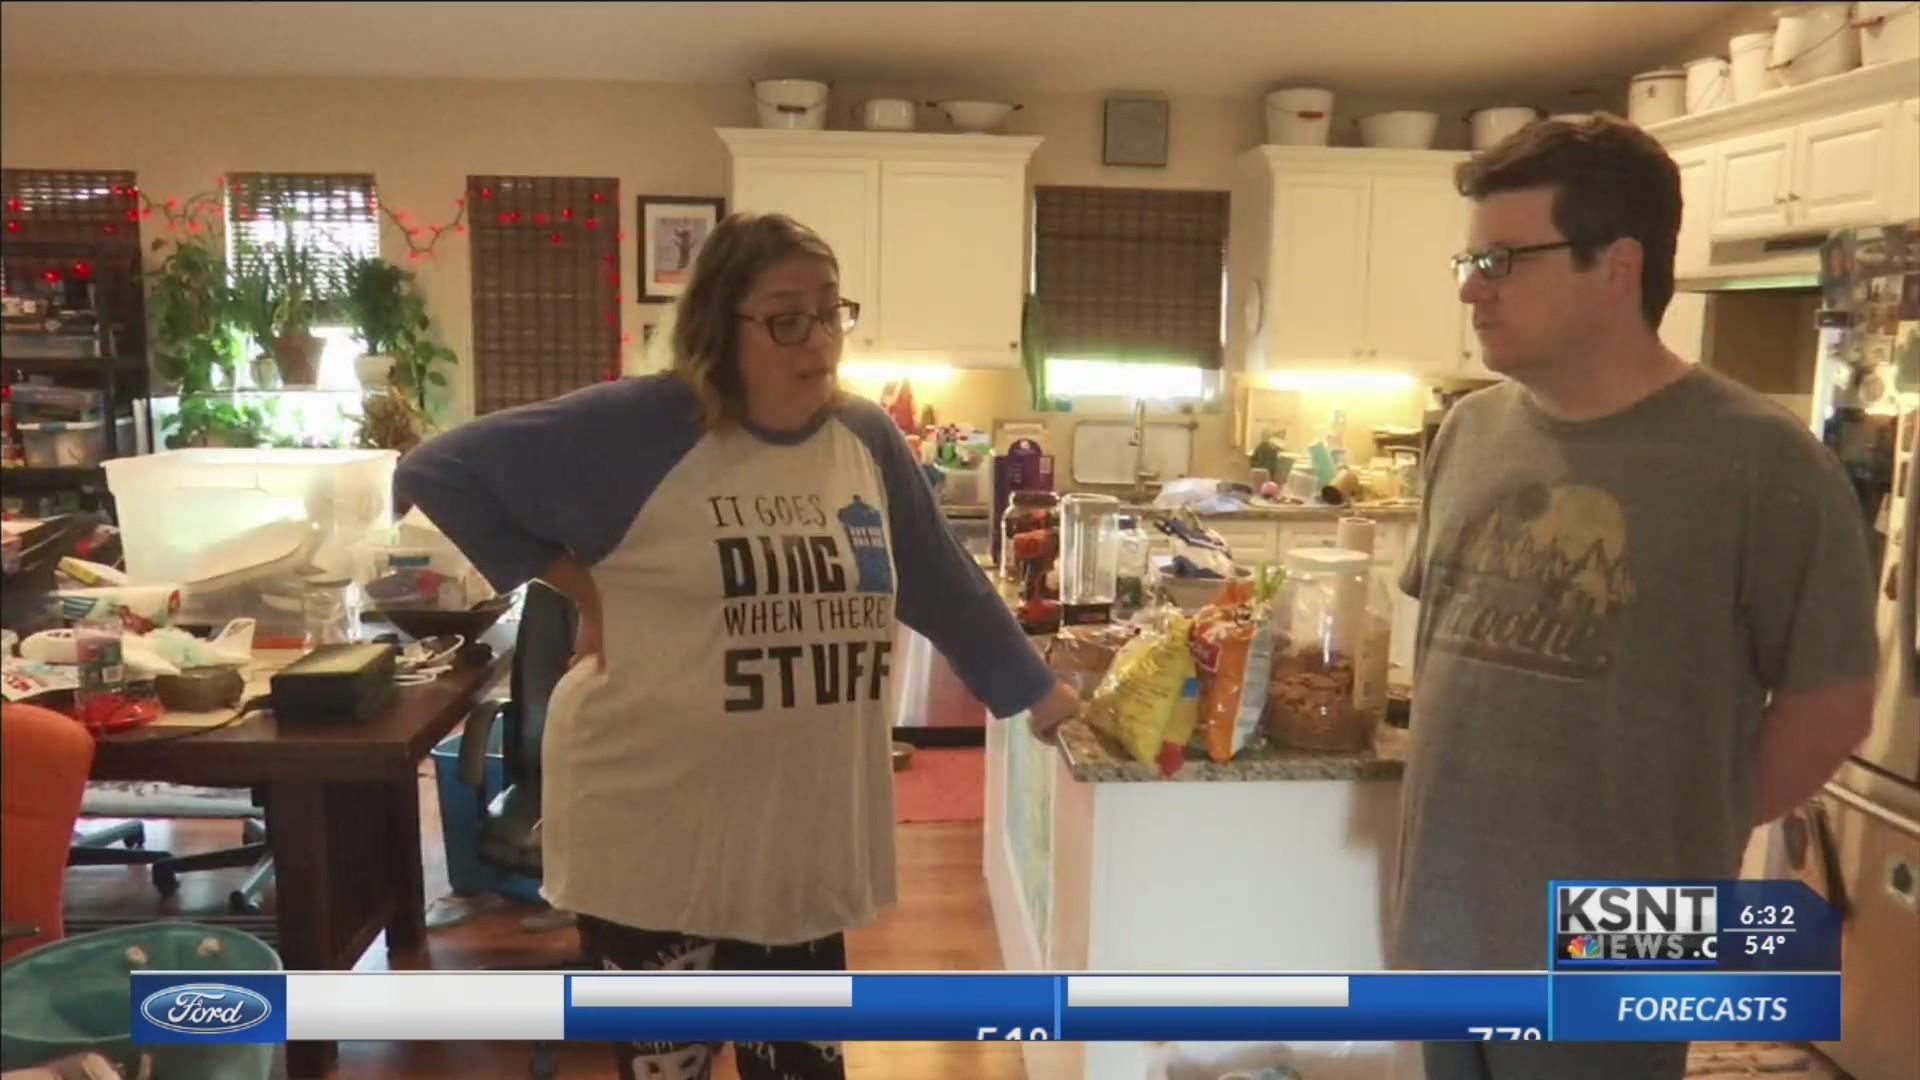 Burlington couple worried after repeated flooding in neighborhood